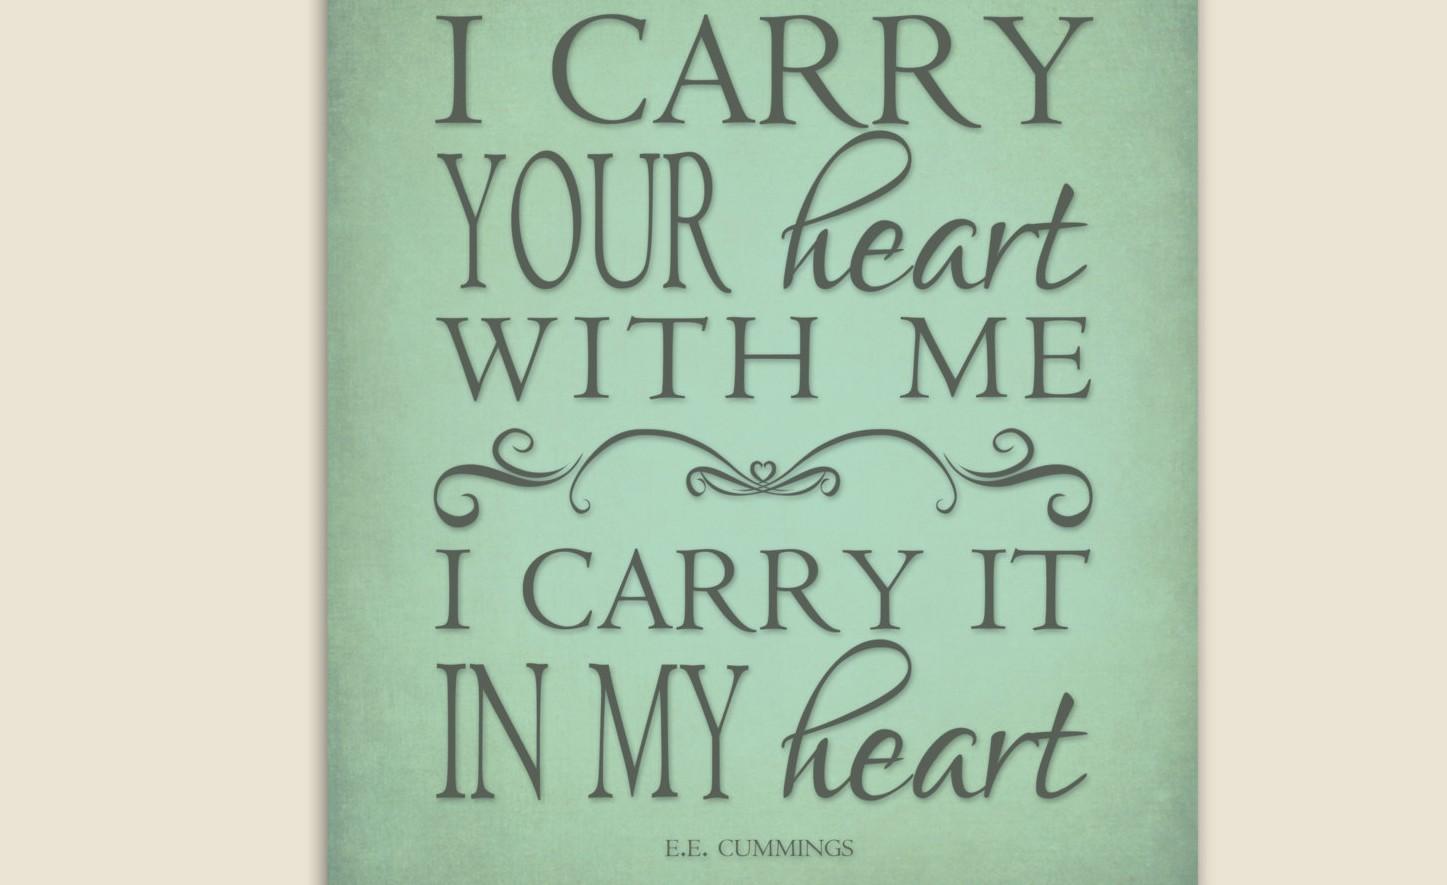 E e cummings i carry your heart